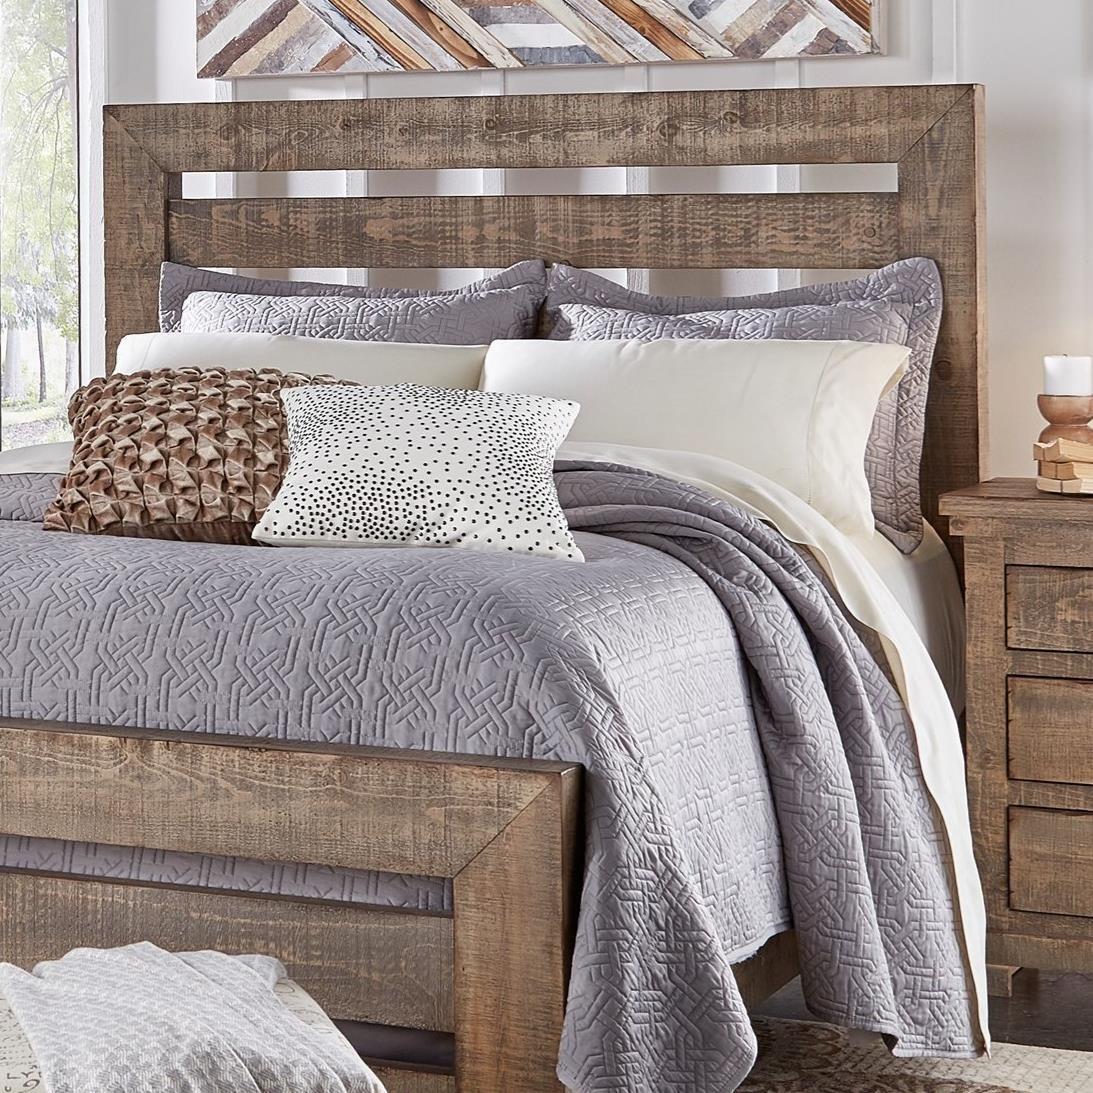 Progressive Furniture Willow King Slat Headboard With Distressed Pine Frame